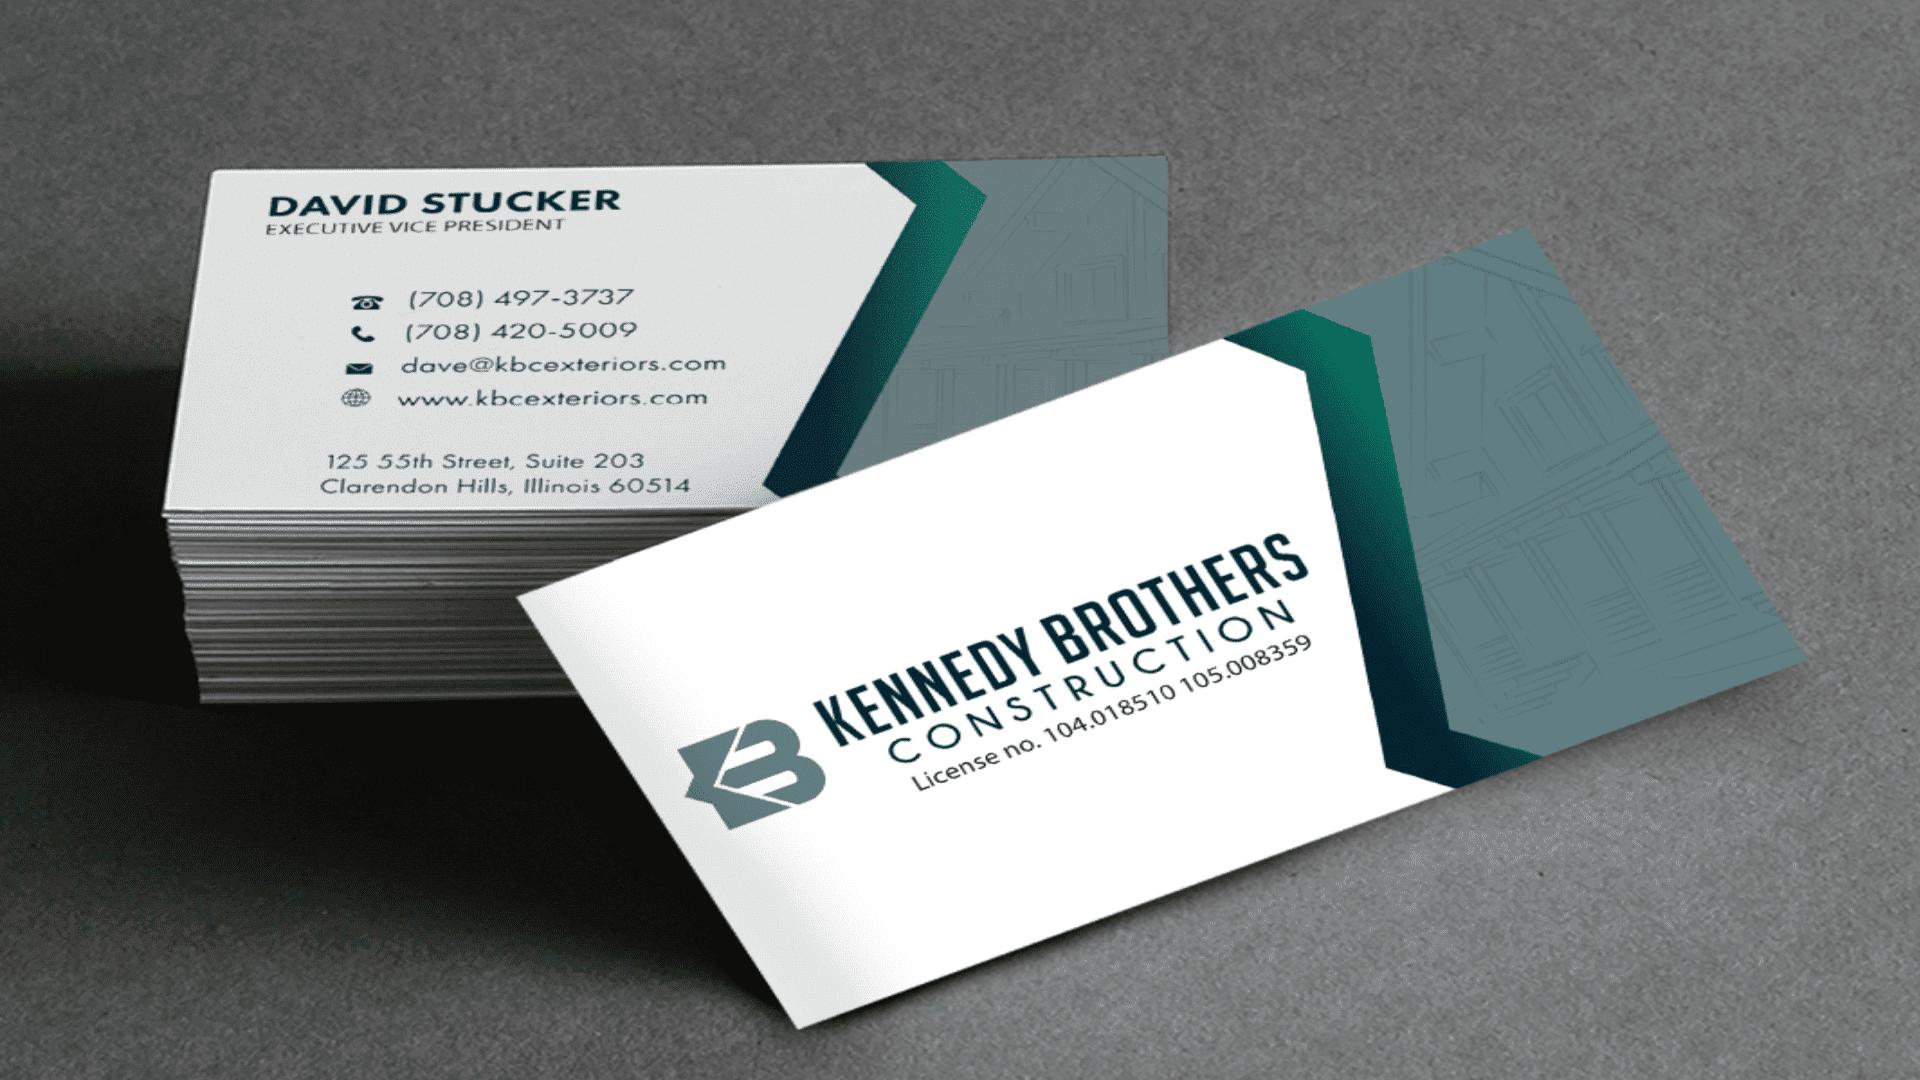 Printed-kbc-company-cards-mockups